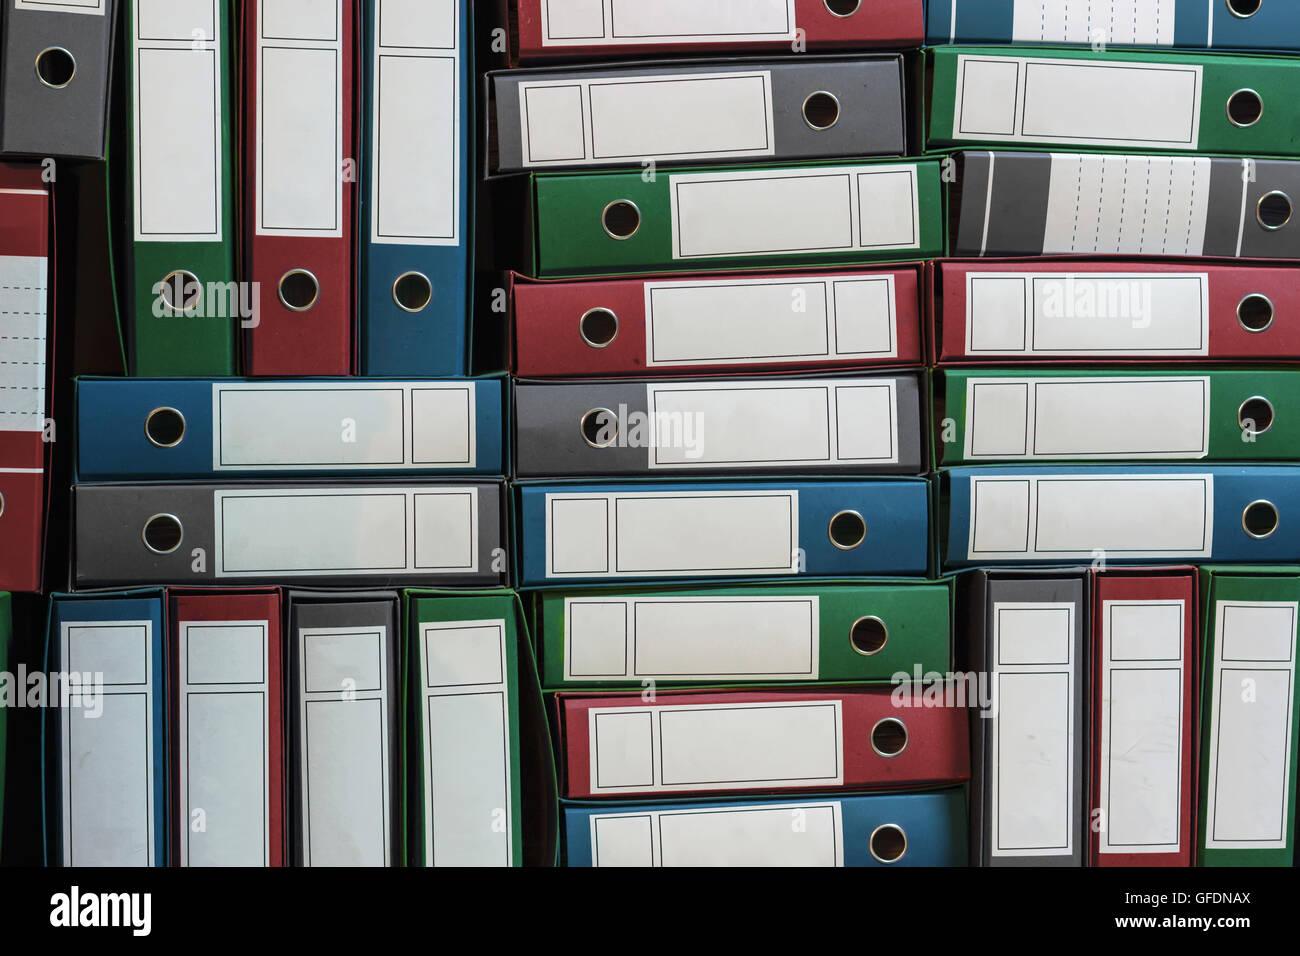 Binders Archive, Ring Binders, Bureaucracy, bookkeeping - Stock Image